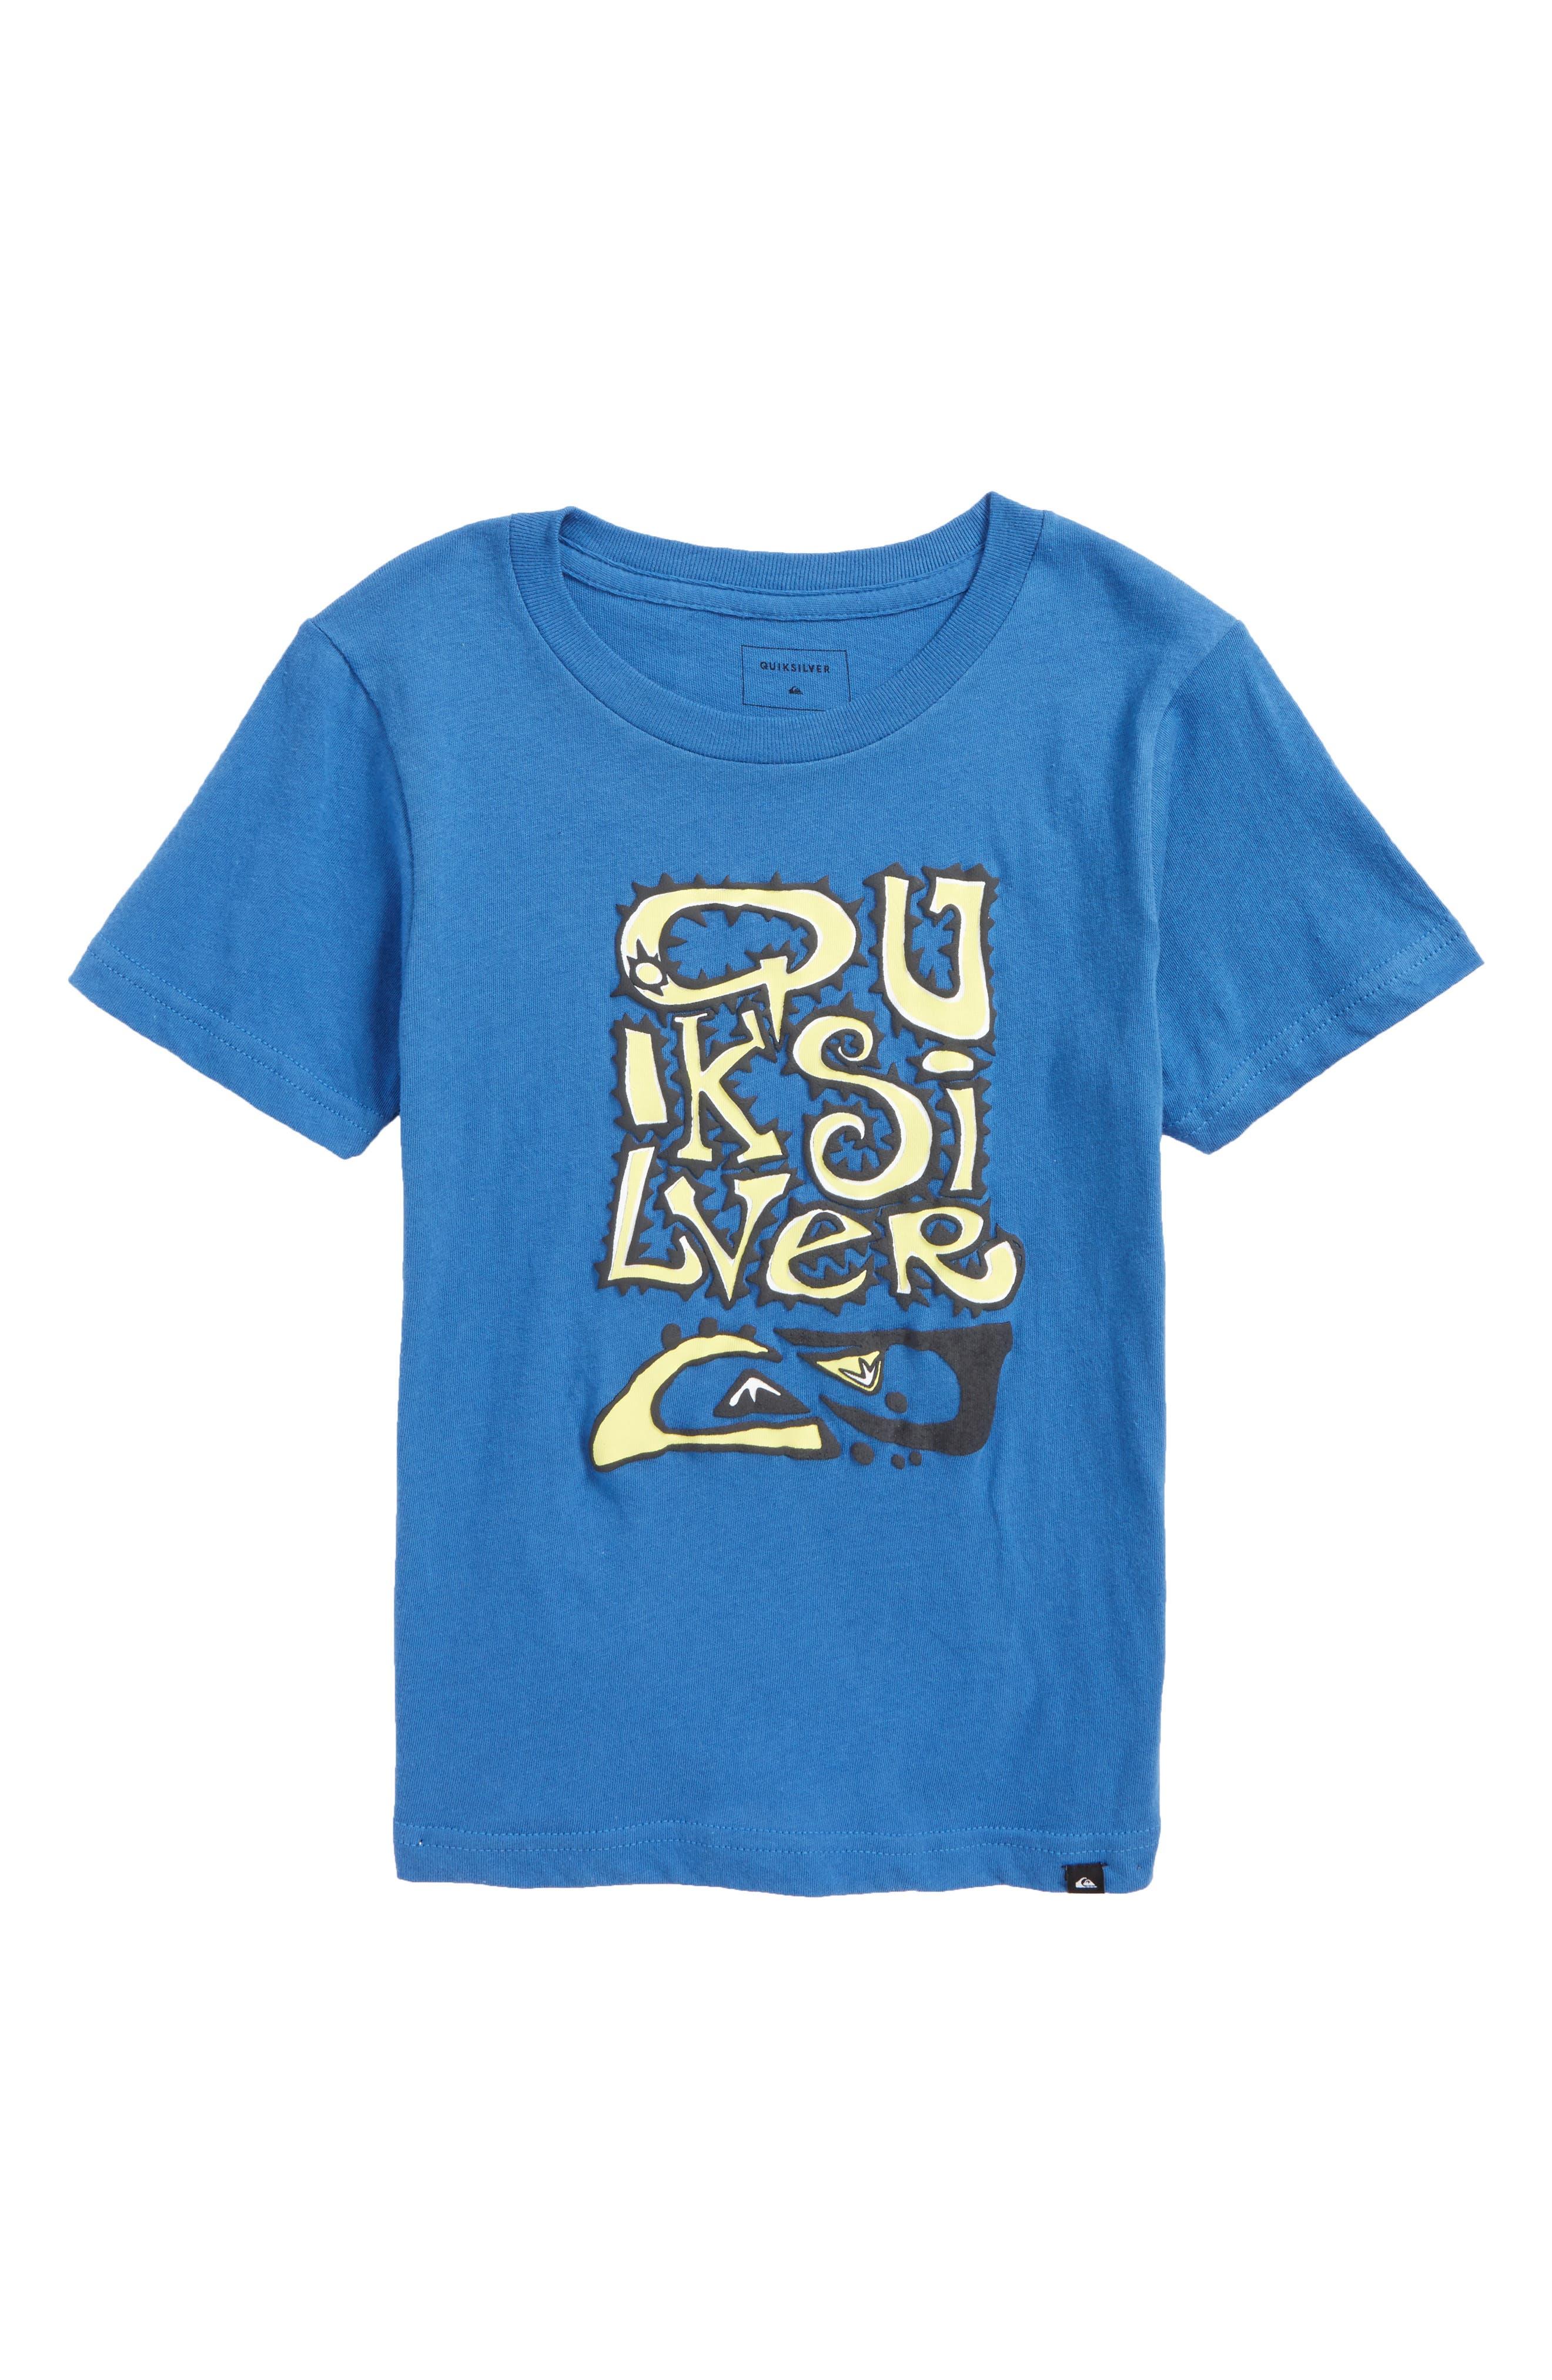 Alternate Image 1 Selected - Quiksilver Wauke Graphic T-Shirt (Toddler Boys & Little Boys)